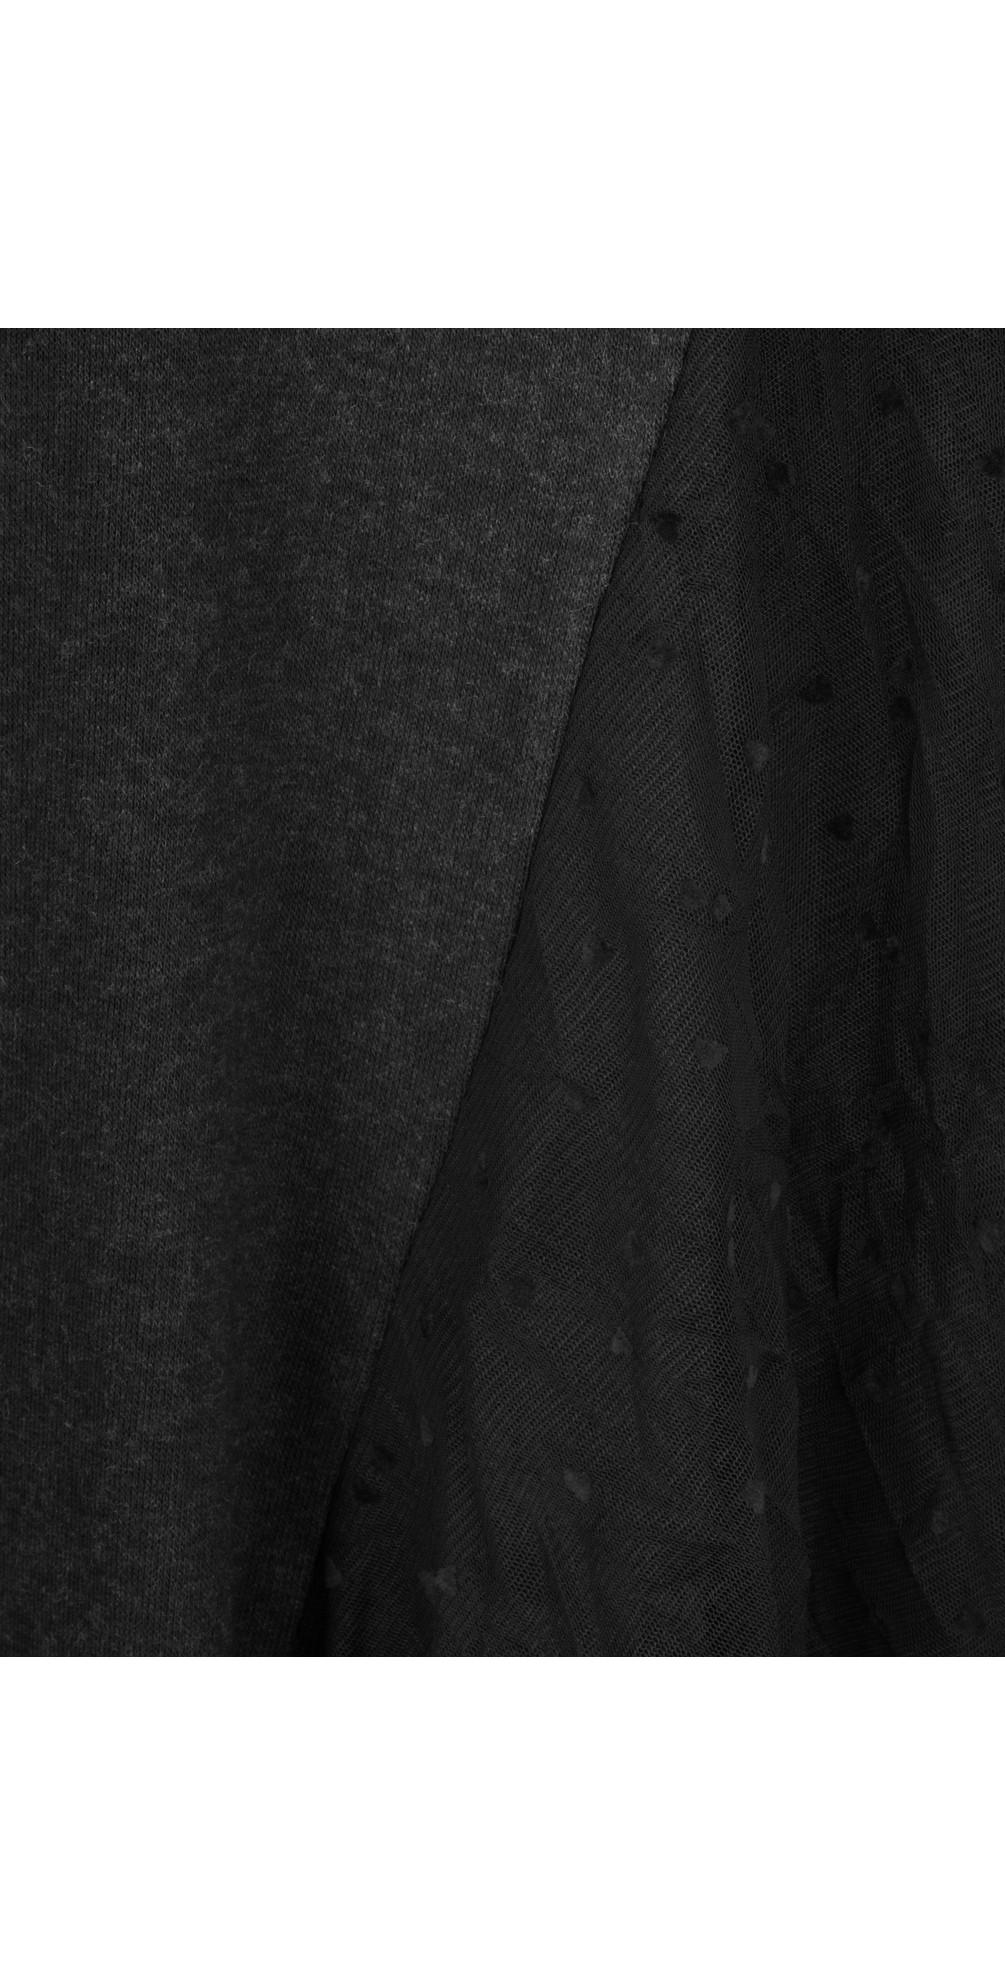 Lilas Mesh Tunic Dress main image